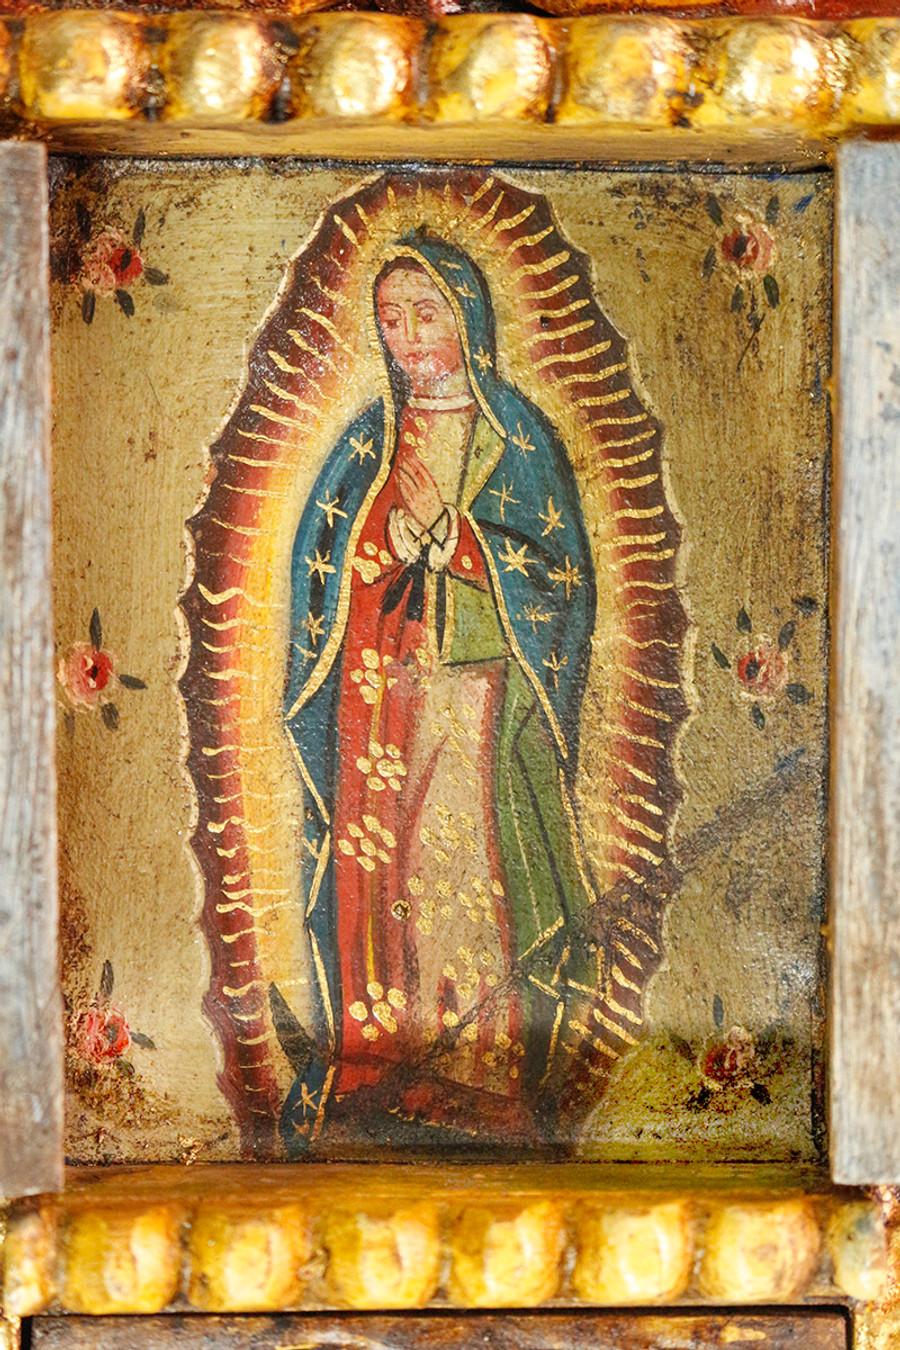 Guadalupe Virgin Colonial Peru Art Handmade Retablo Handcarved Altarpiece (4576)